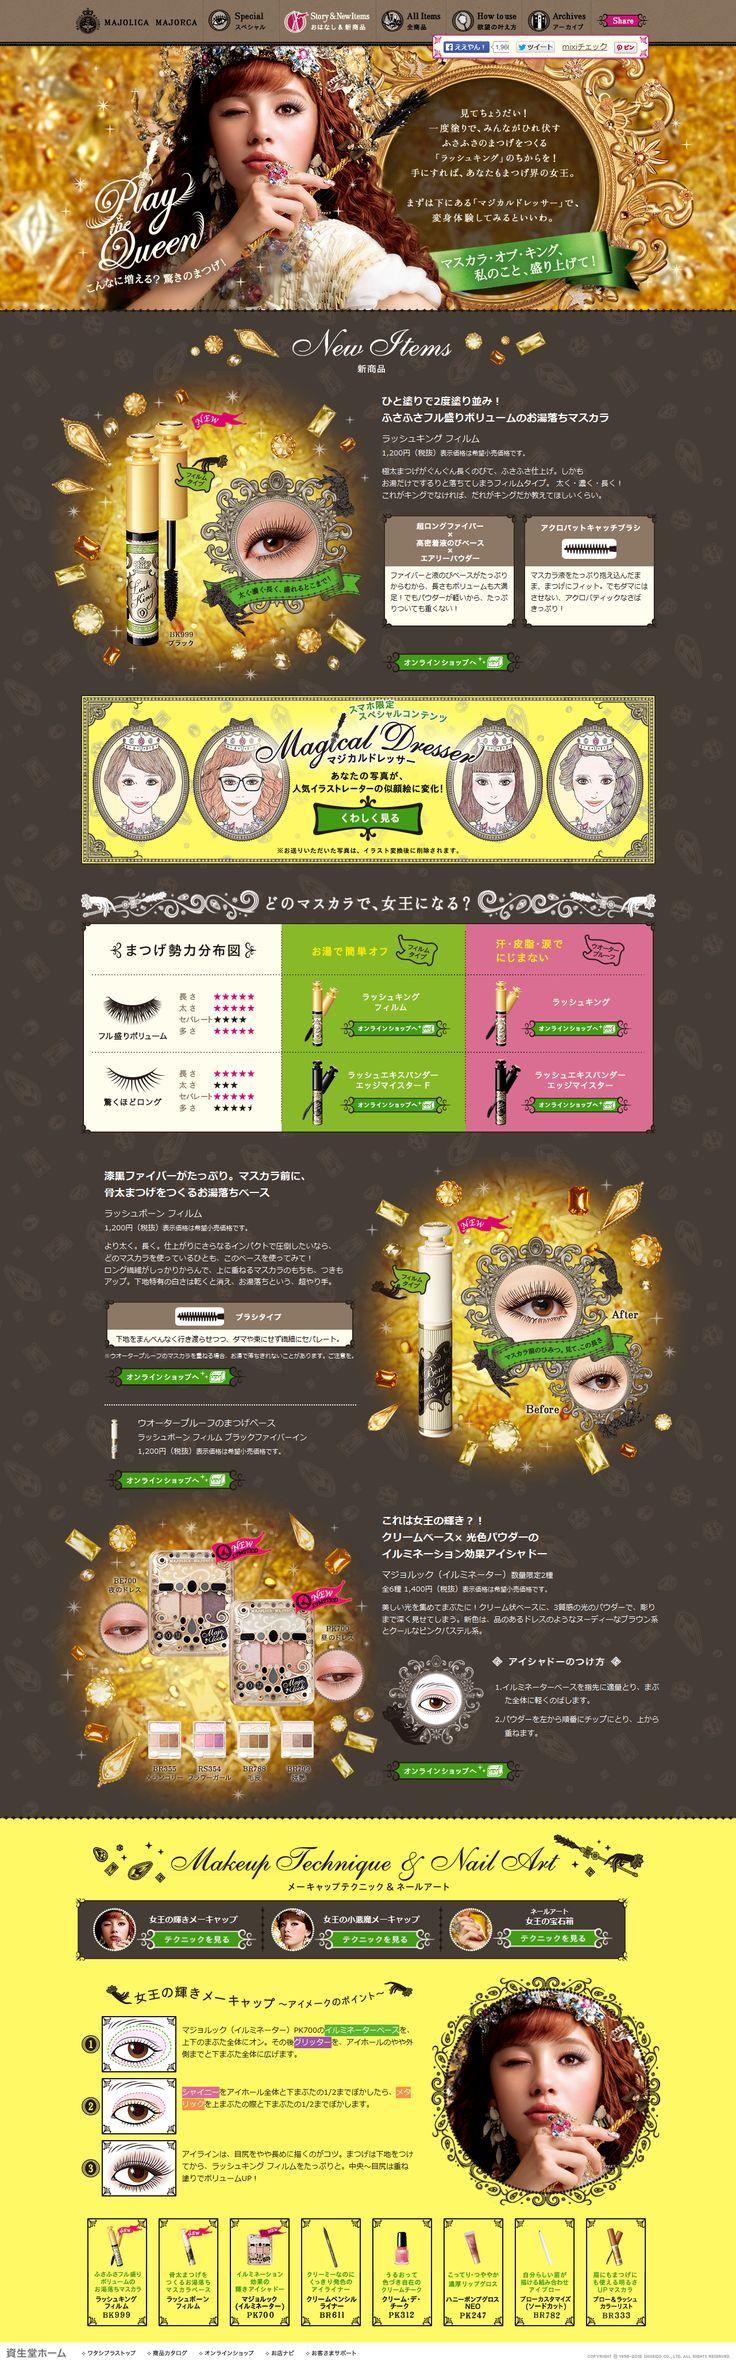 http://www.shiseido.co.jp/mj/story/index.html MAJOLICA MAJORCA|資生堂